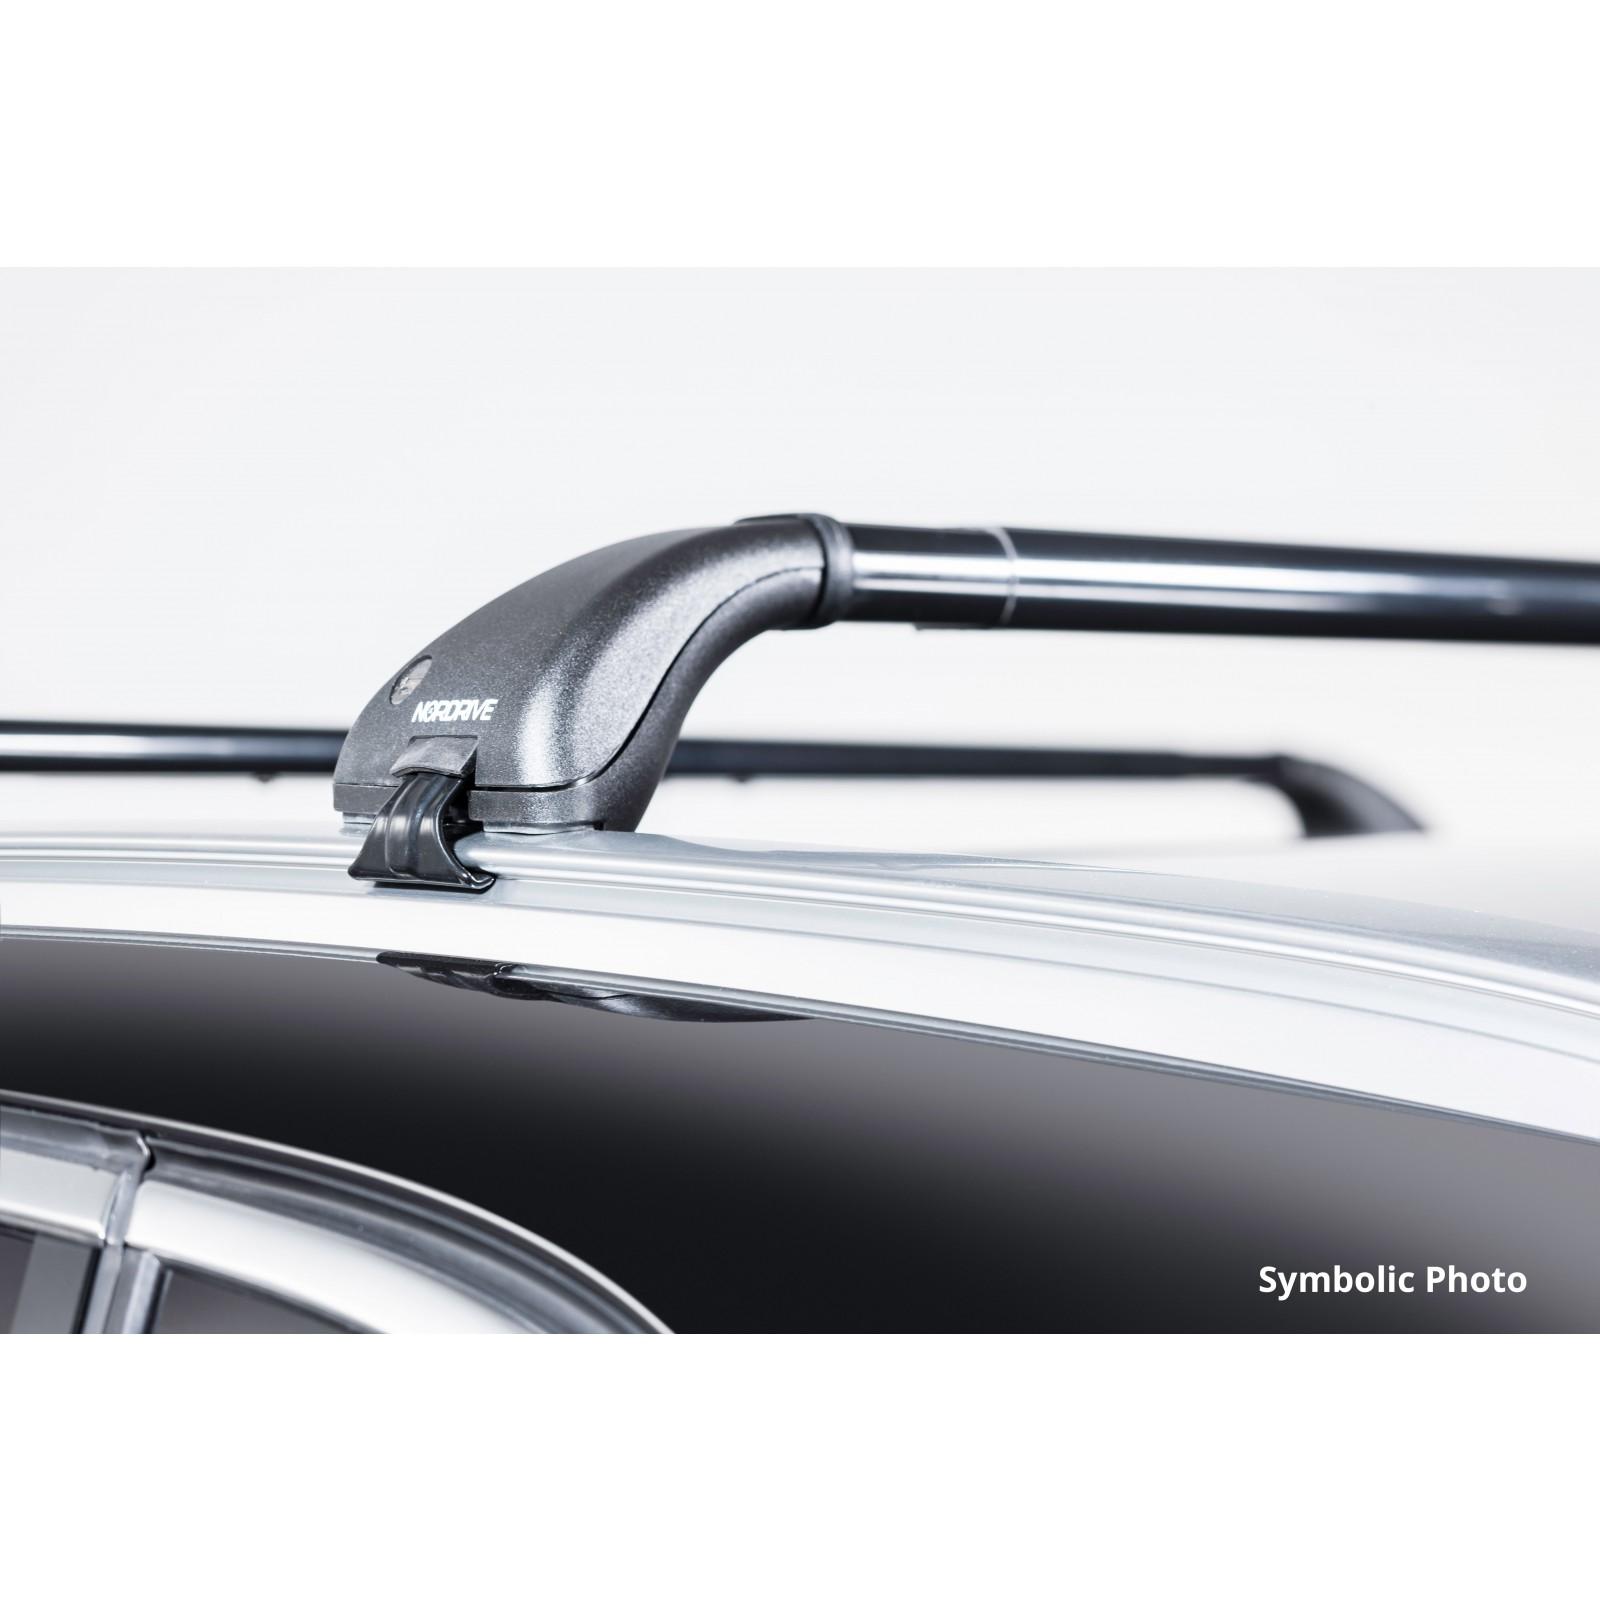 barres de toit en acier pour ford focus wagon ford. Black Bedroom Furniture Sets. Home Design Ideas